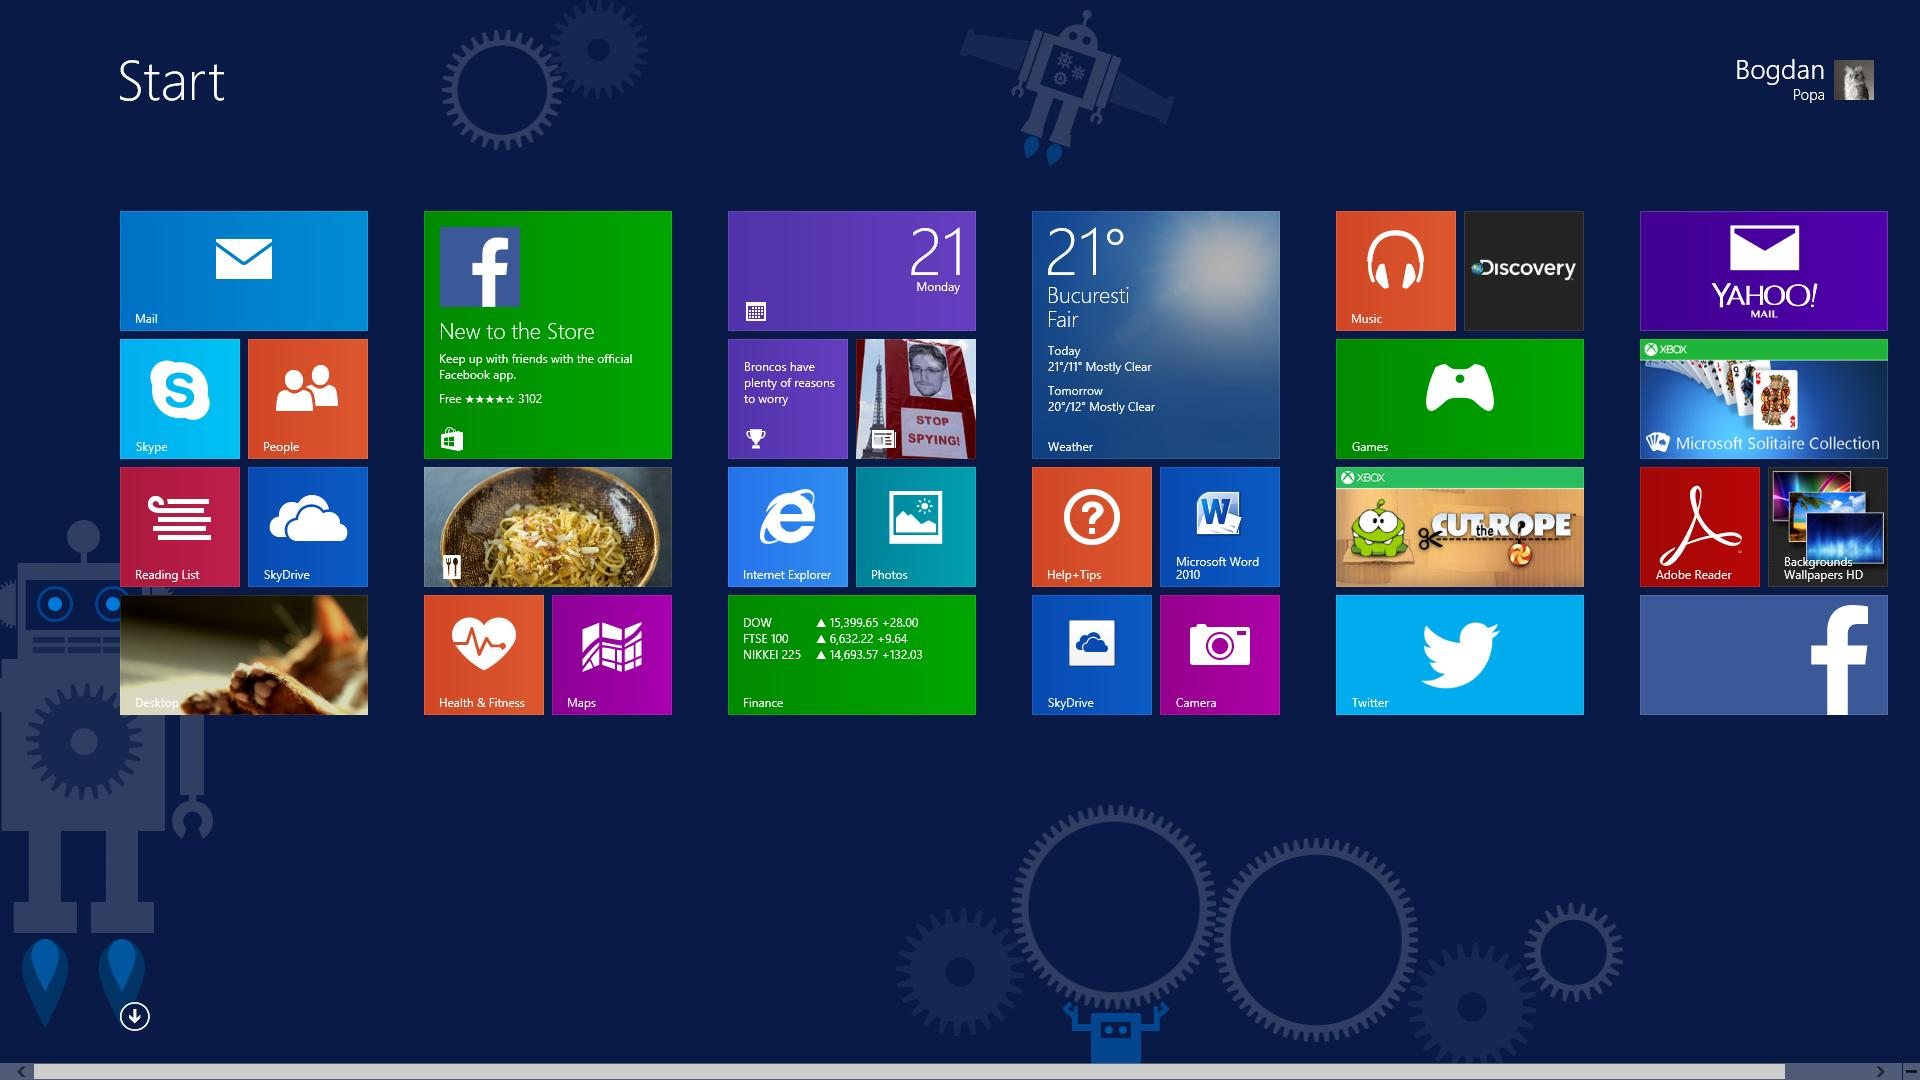 microsoft windows 8.1 update to windows 10